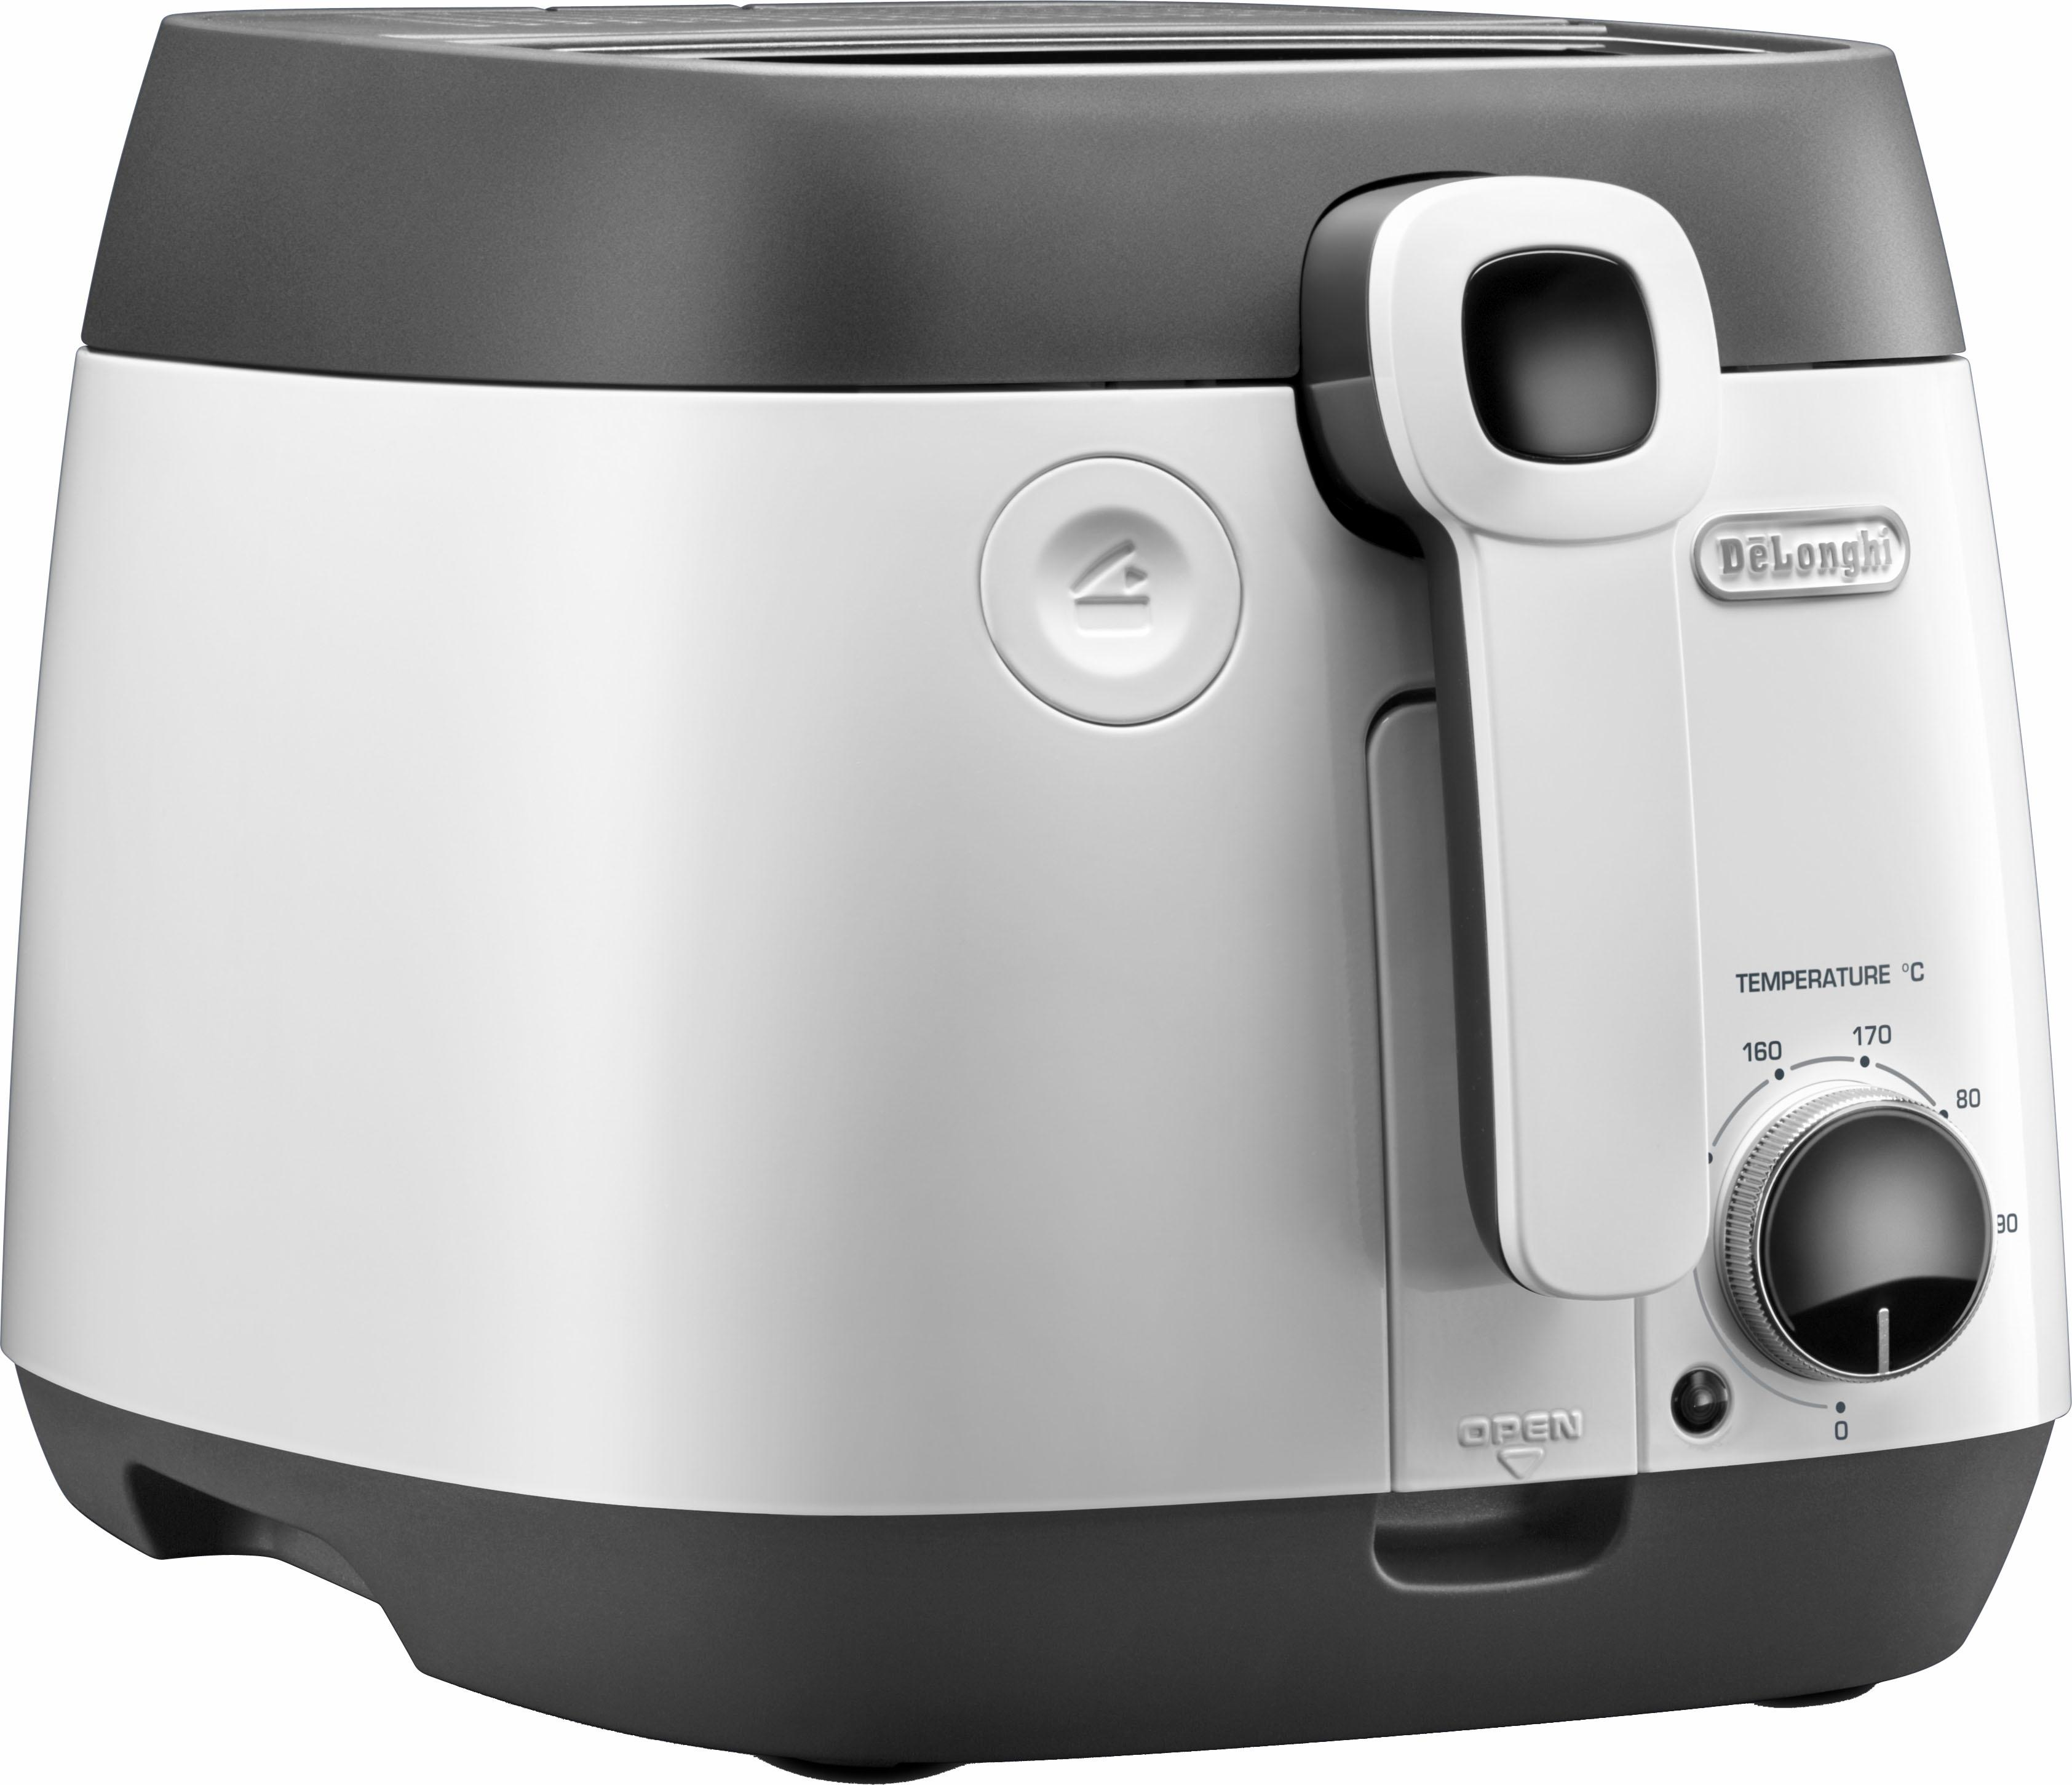 De´Longhi Fritteuse FS6055 1800 Watt Fassungsvermögen 2 4 Liter | Küche und Esszimmer > Küchengeräte > Fritteusen | Weiß | Delonghi